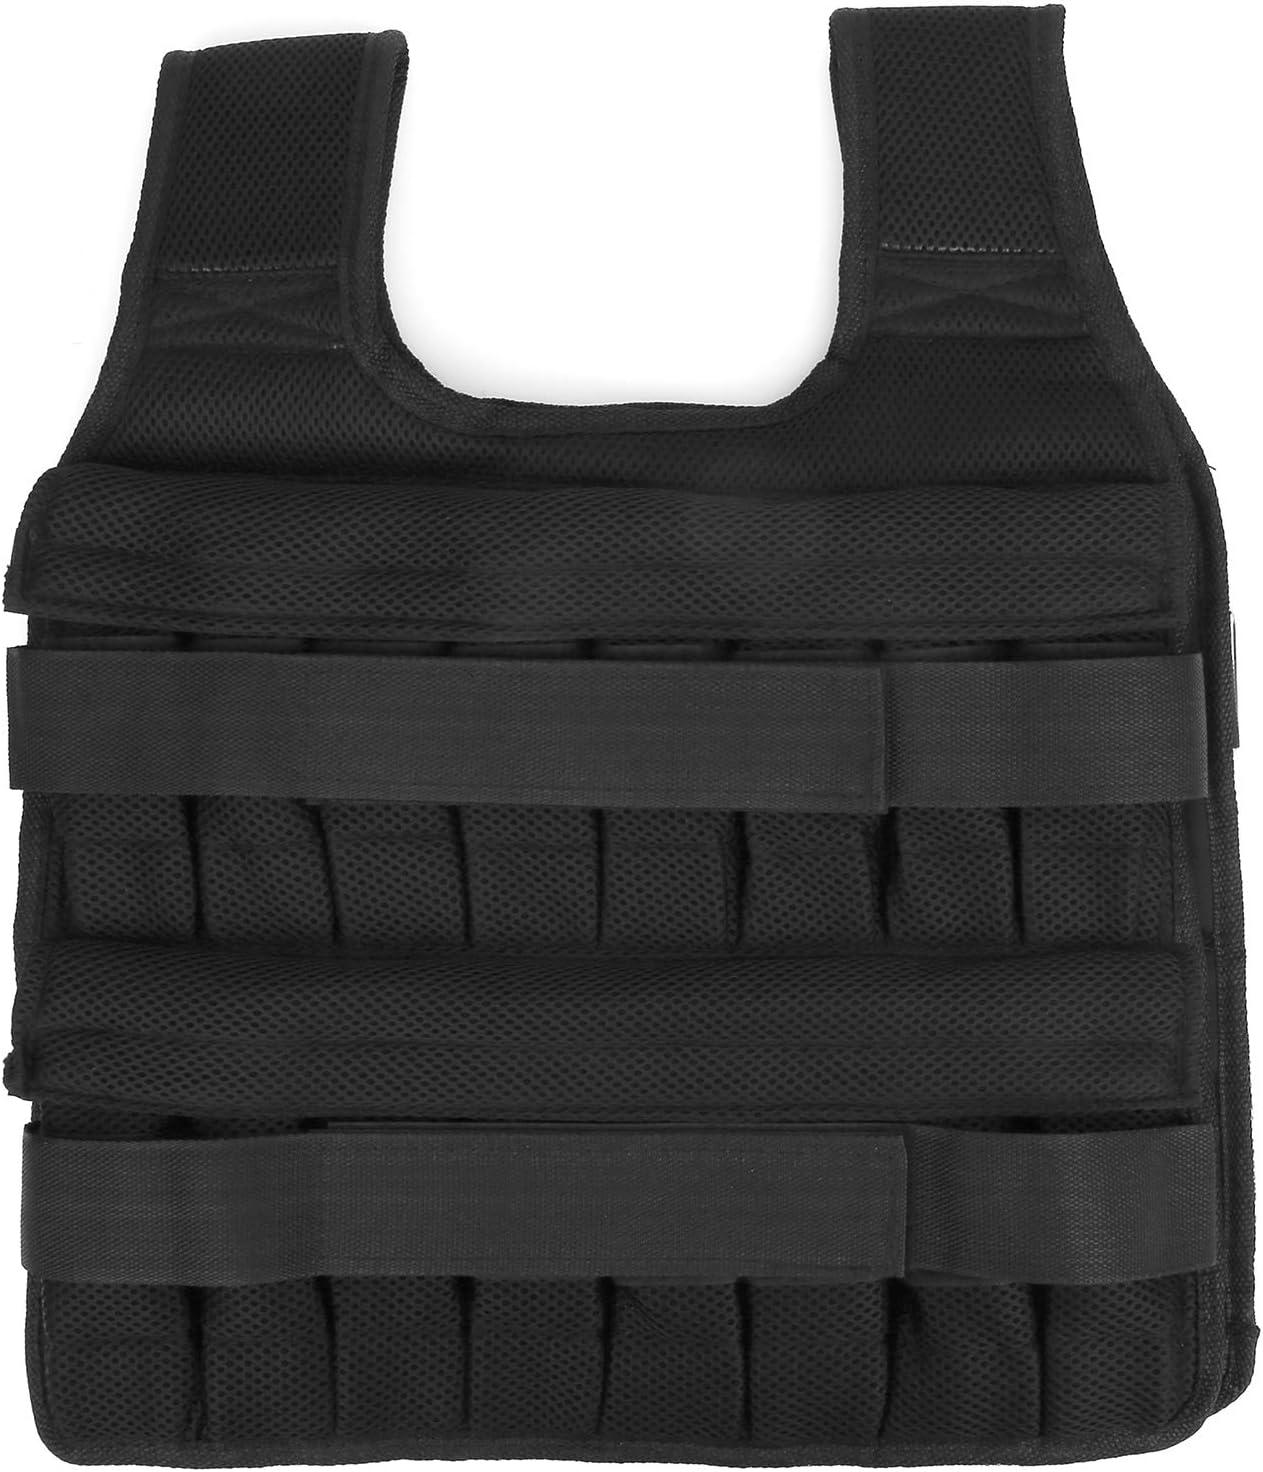 Okuyonic Wholesale Shock Absorption Weighted Ve Sandbag Training Vest 55% OFF